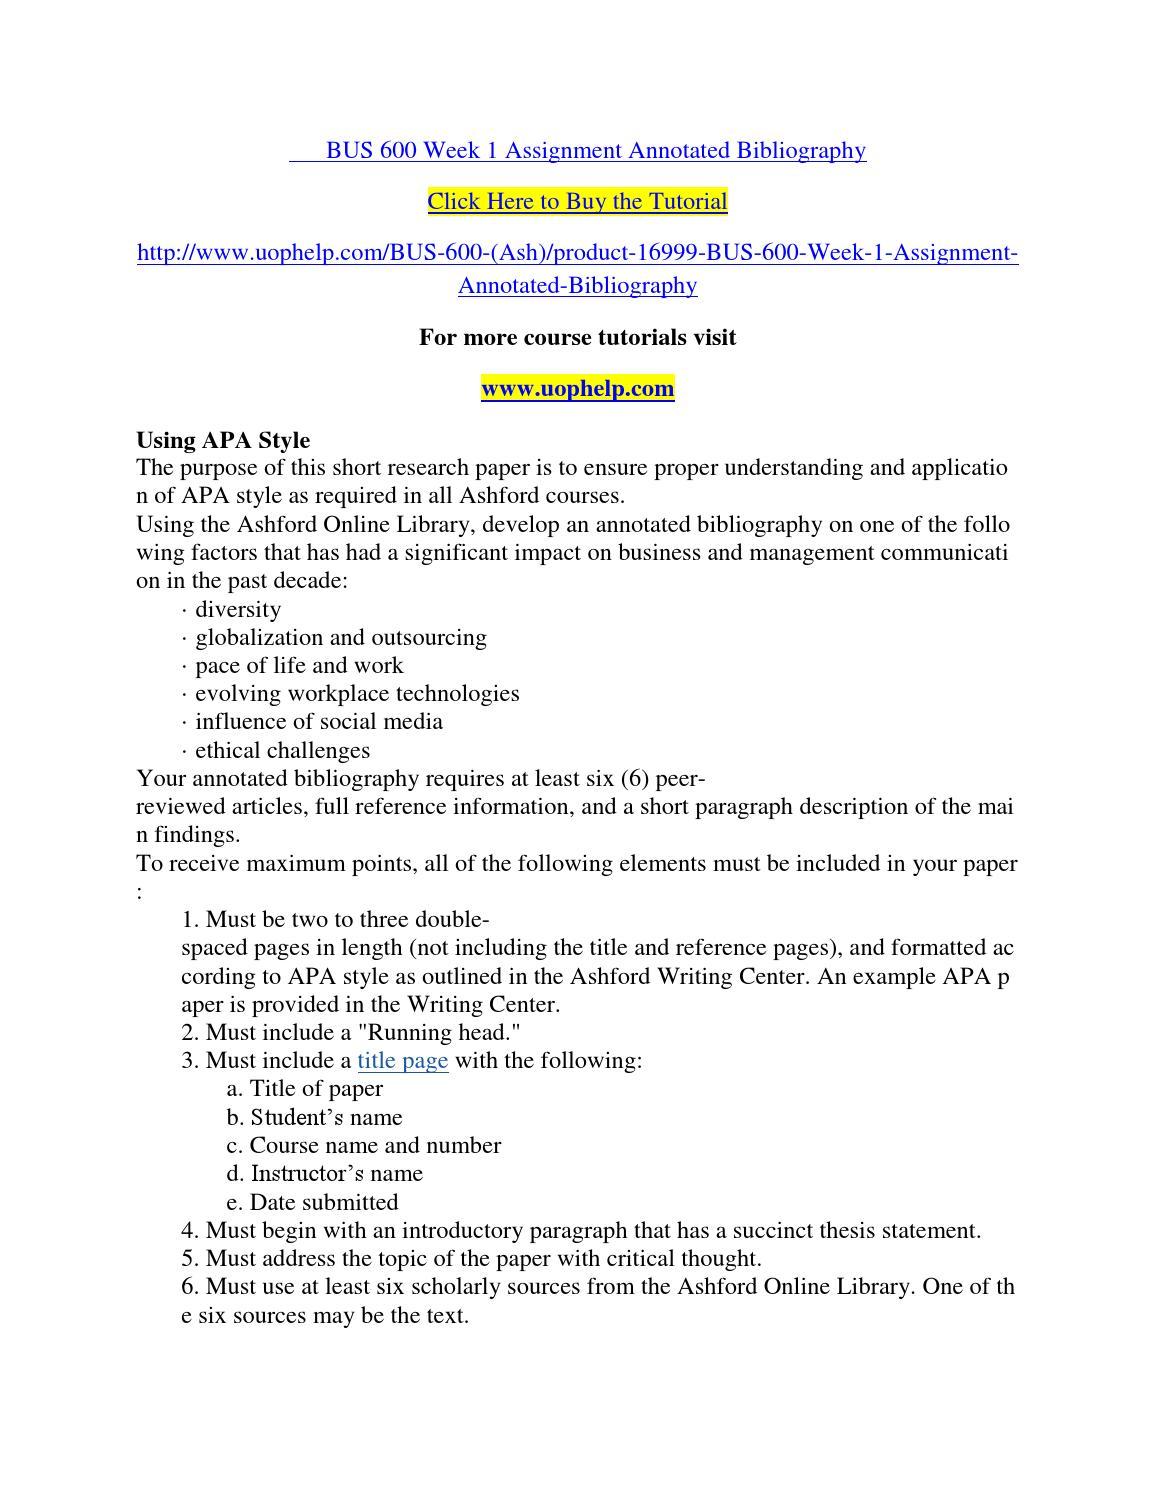 Buy an apa research paper